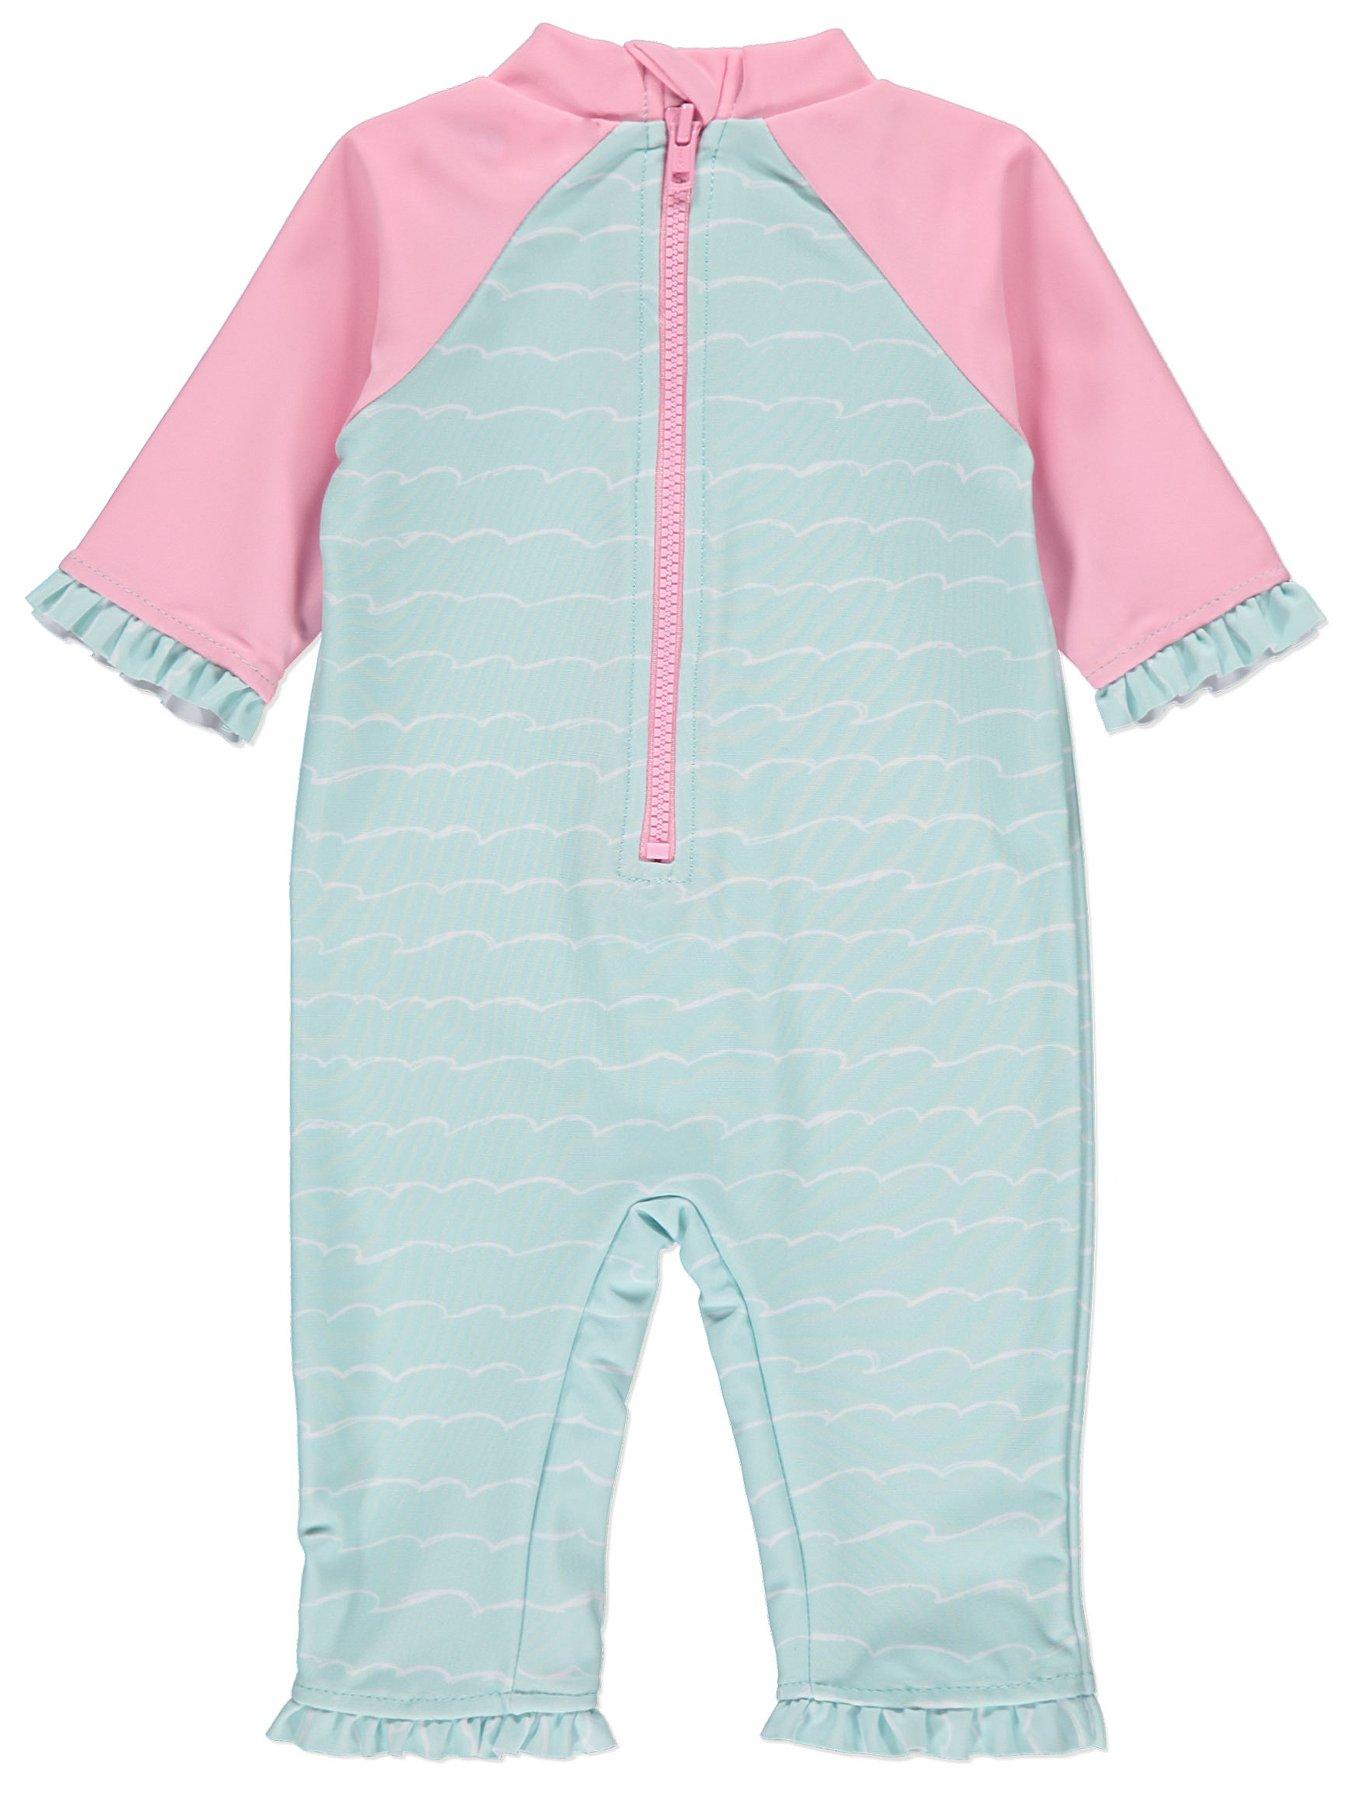 e9ce6d9e83 Disney Finding Nemo Sun Protection UV40 Swimsuit | Baby | George